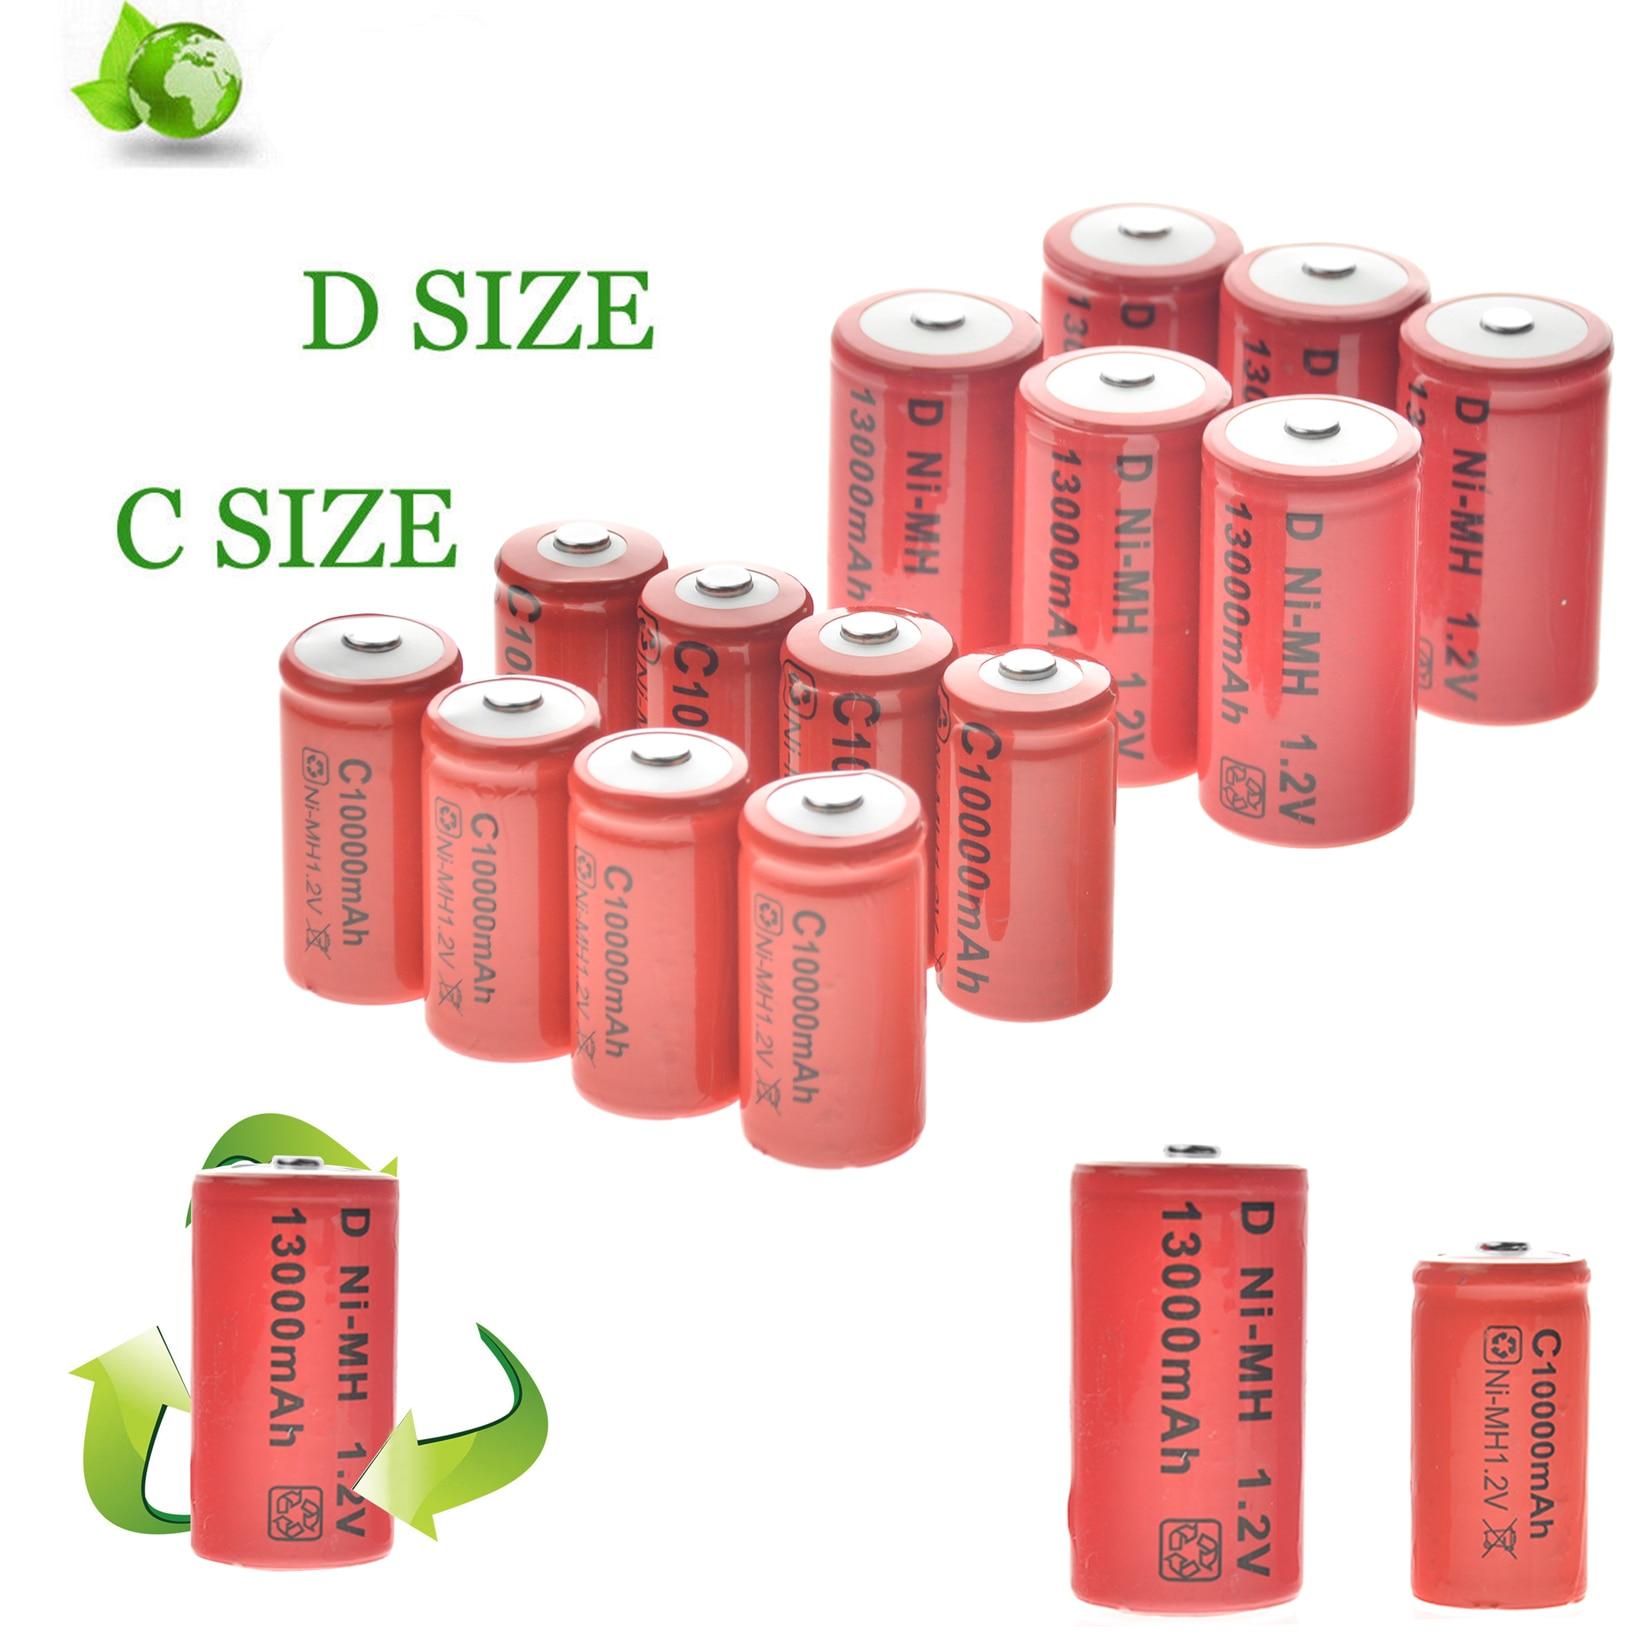 4/8/12 Uds C tamaño 10000 mAh + 4/8/12 Uds Dsize 13000 mAh baterías recargables 1,2 v NI-MH EBL tamaño NI-MH C/D recargable